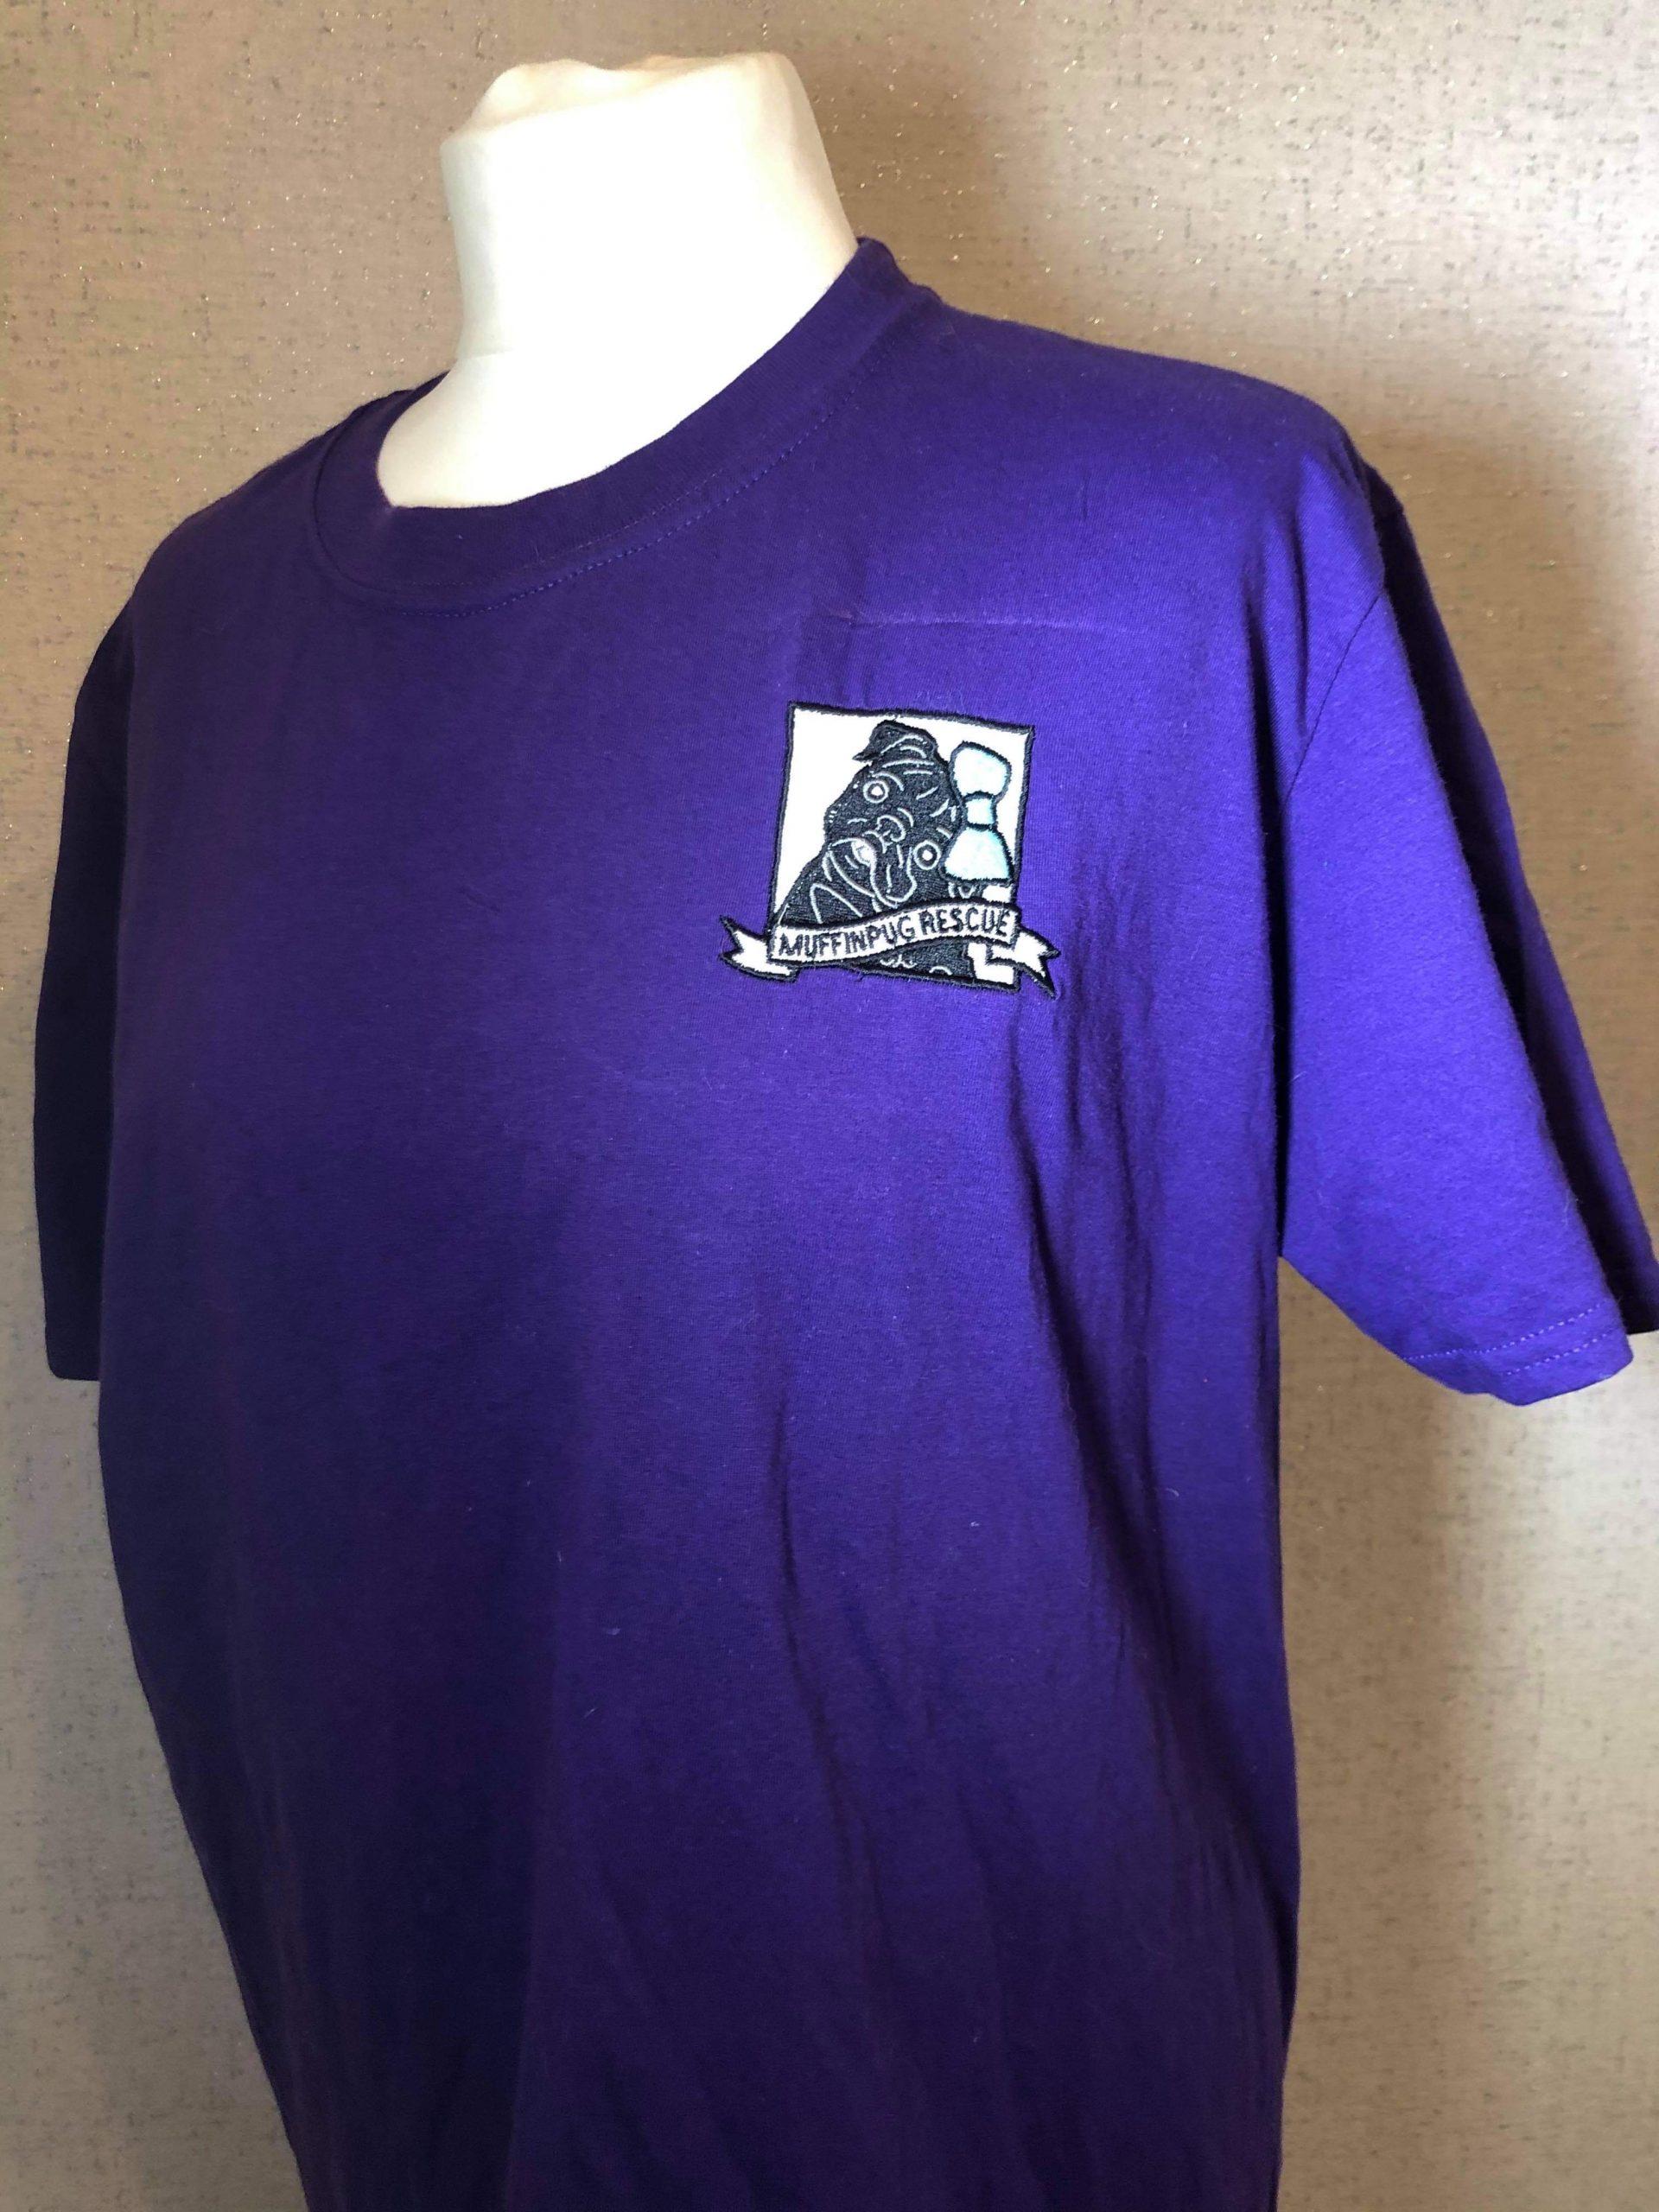 MuffinPug T-shirt